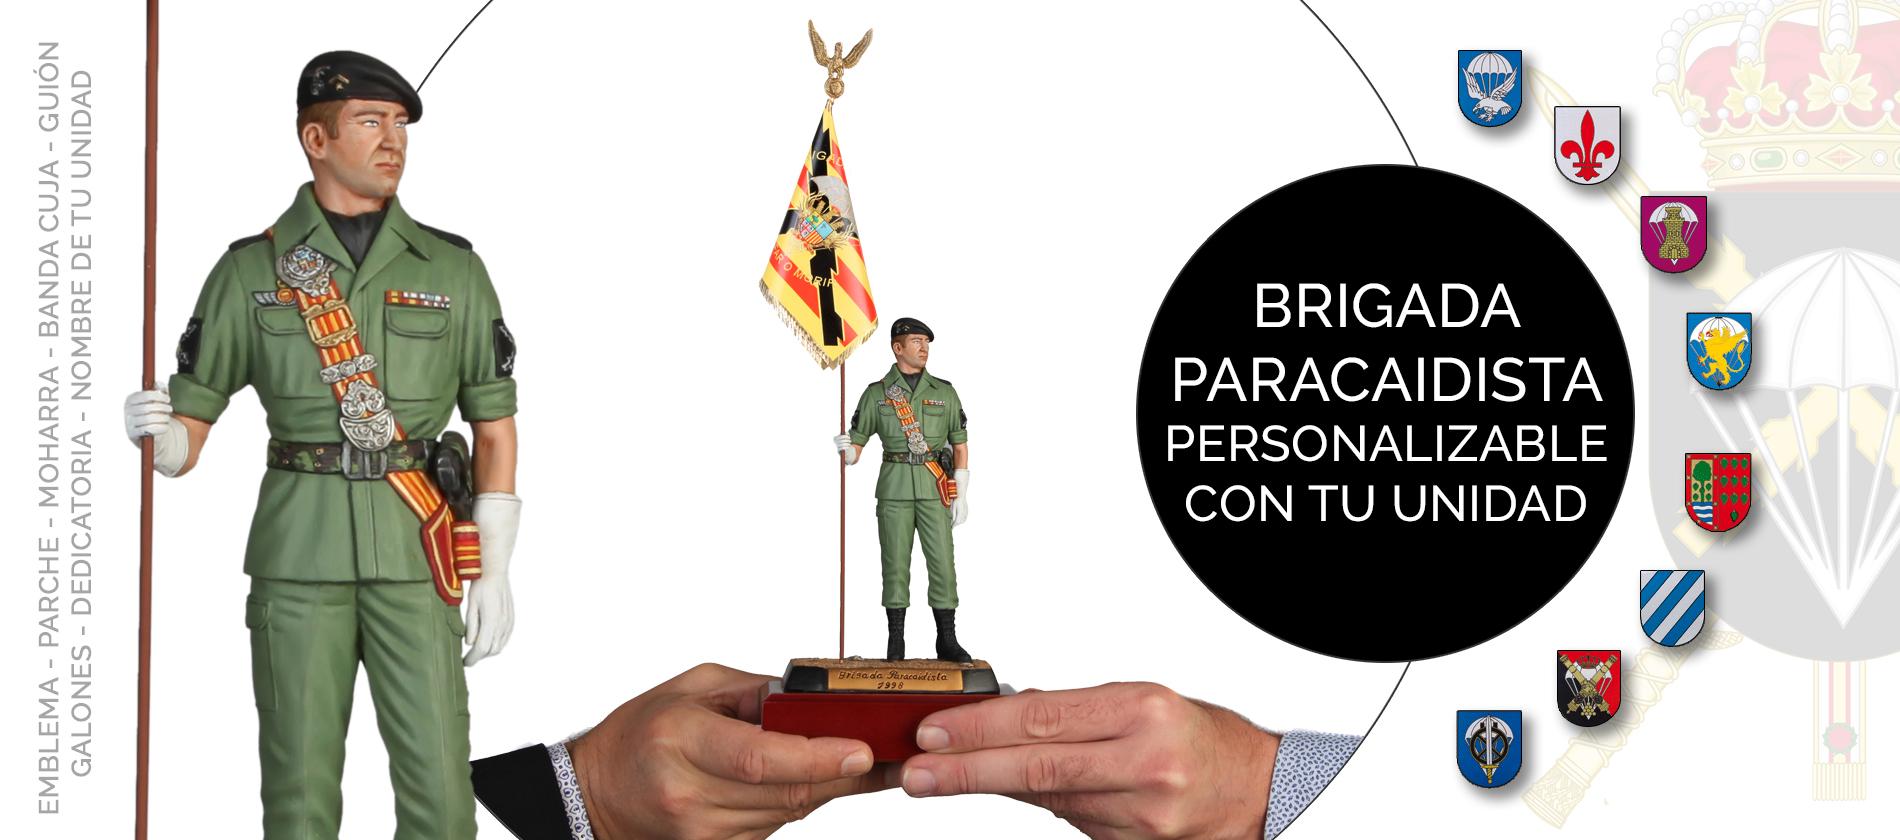 Brigada Paracaidista